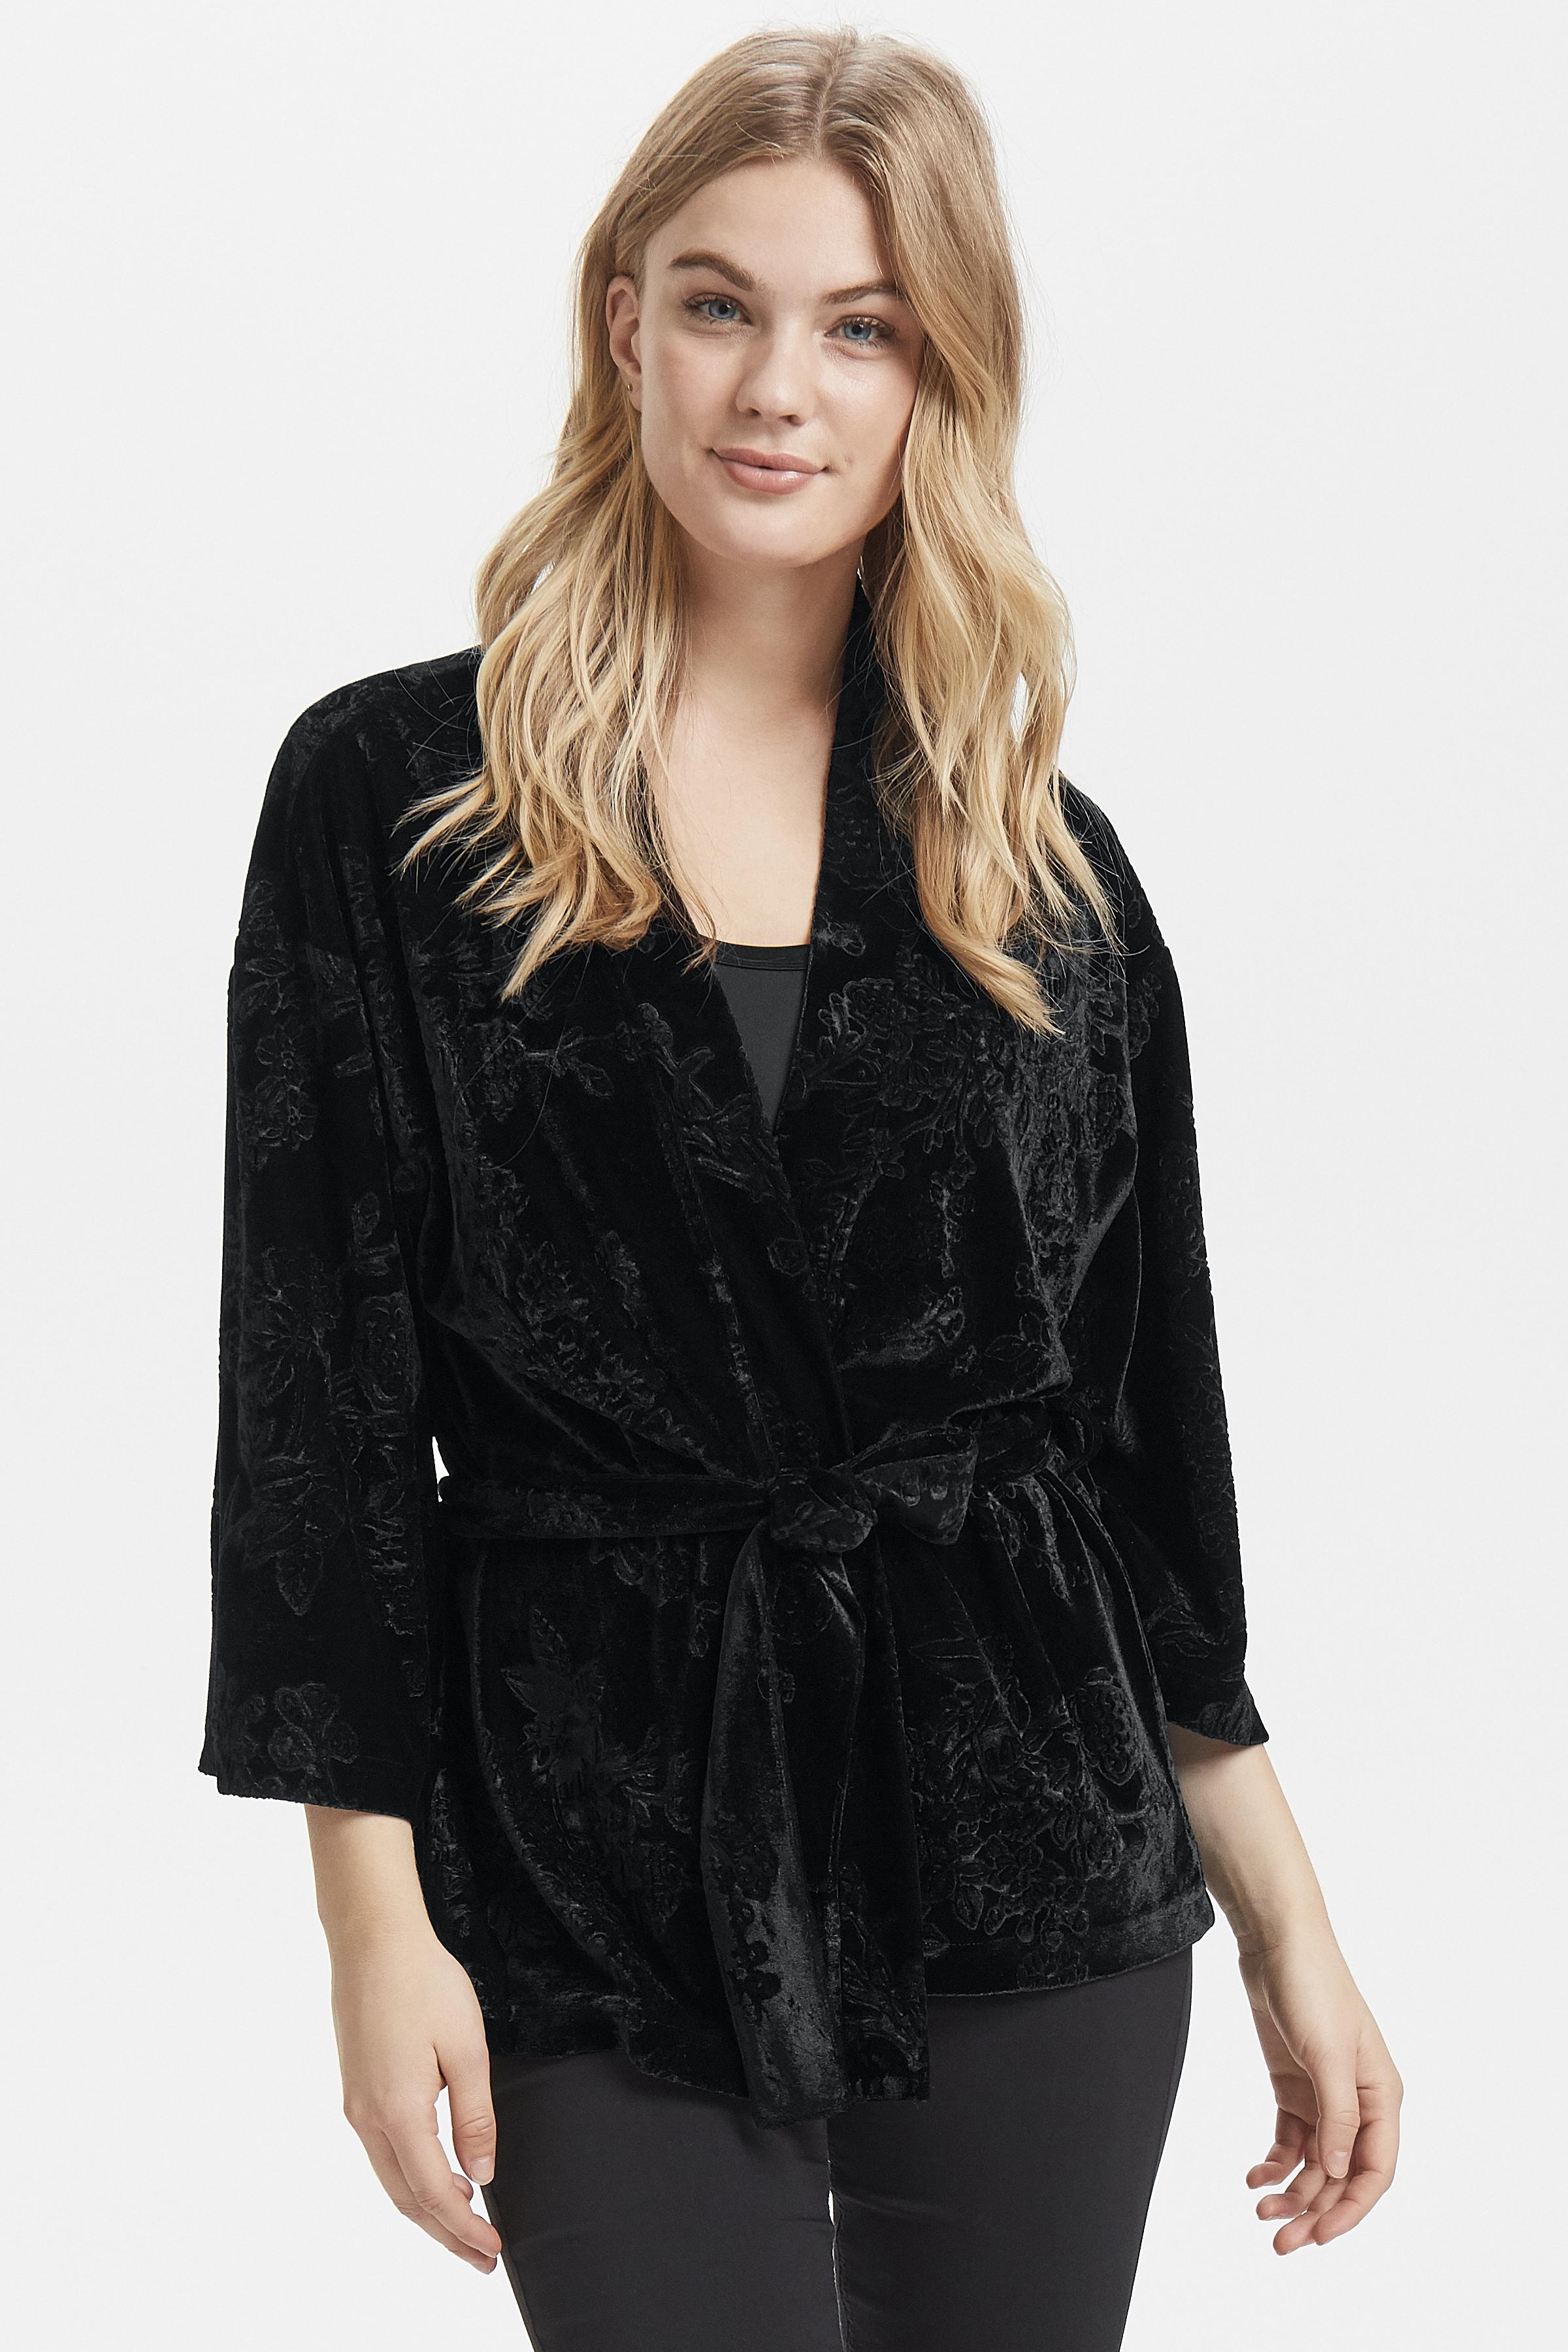 Black Kimono van b.young – Koop Black Kimono hier van size XS-XXL